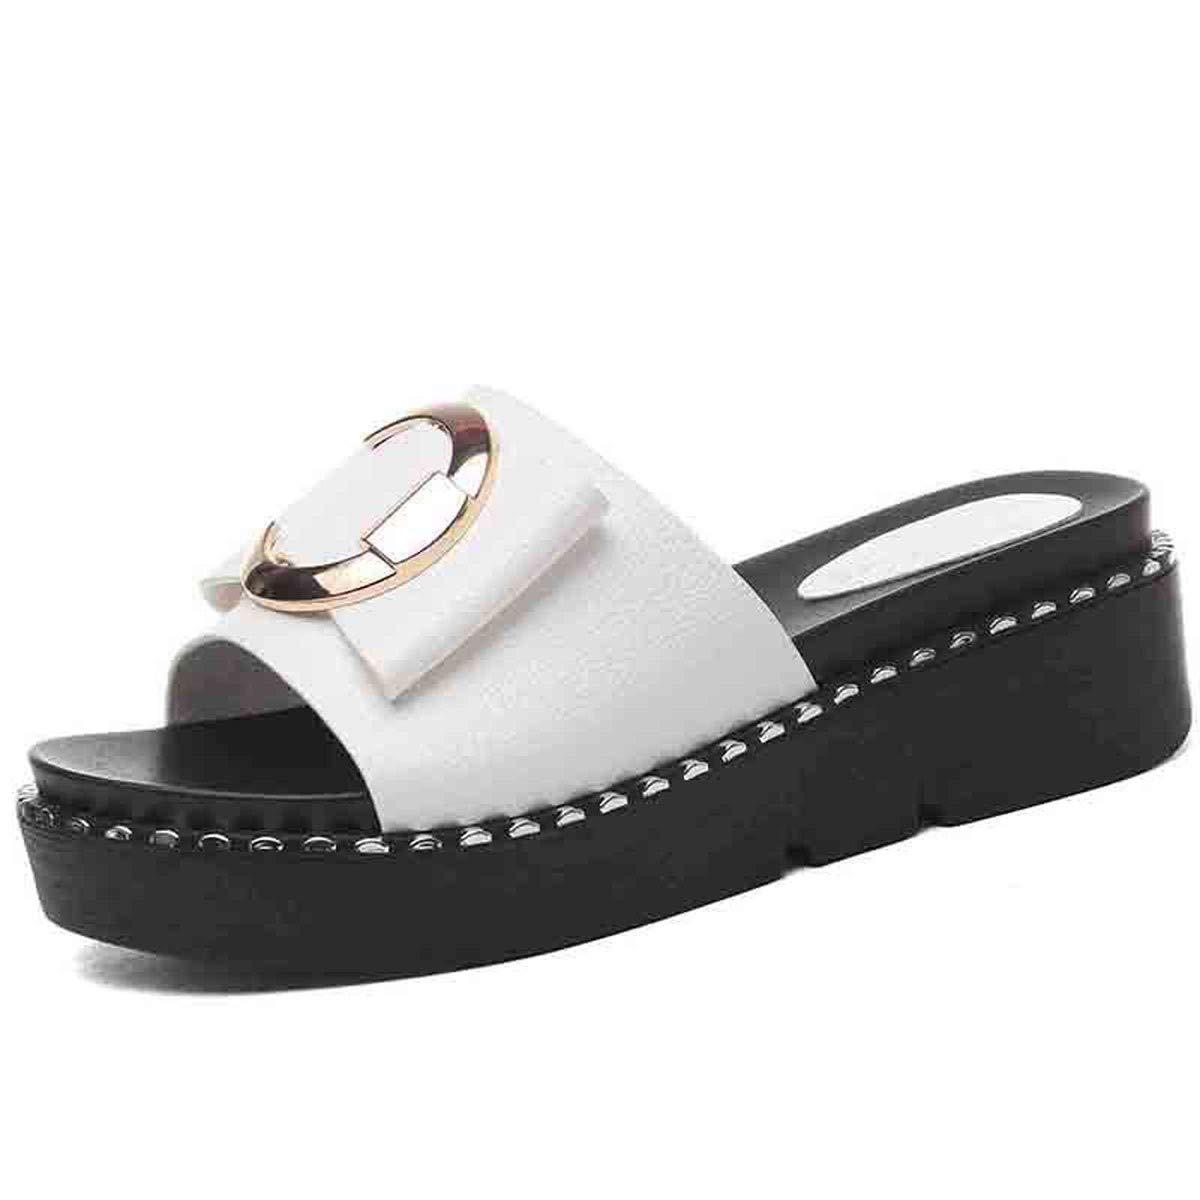 GTVERNH Frauen Schuhe/Frauen - Pantoffeln Sommer Mode Tragen